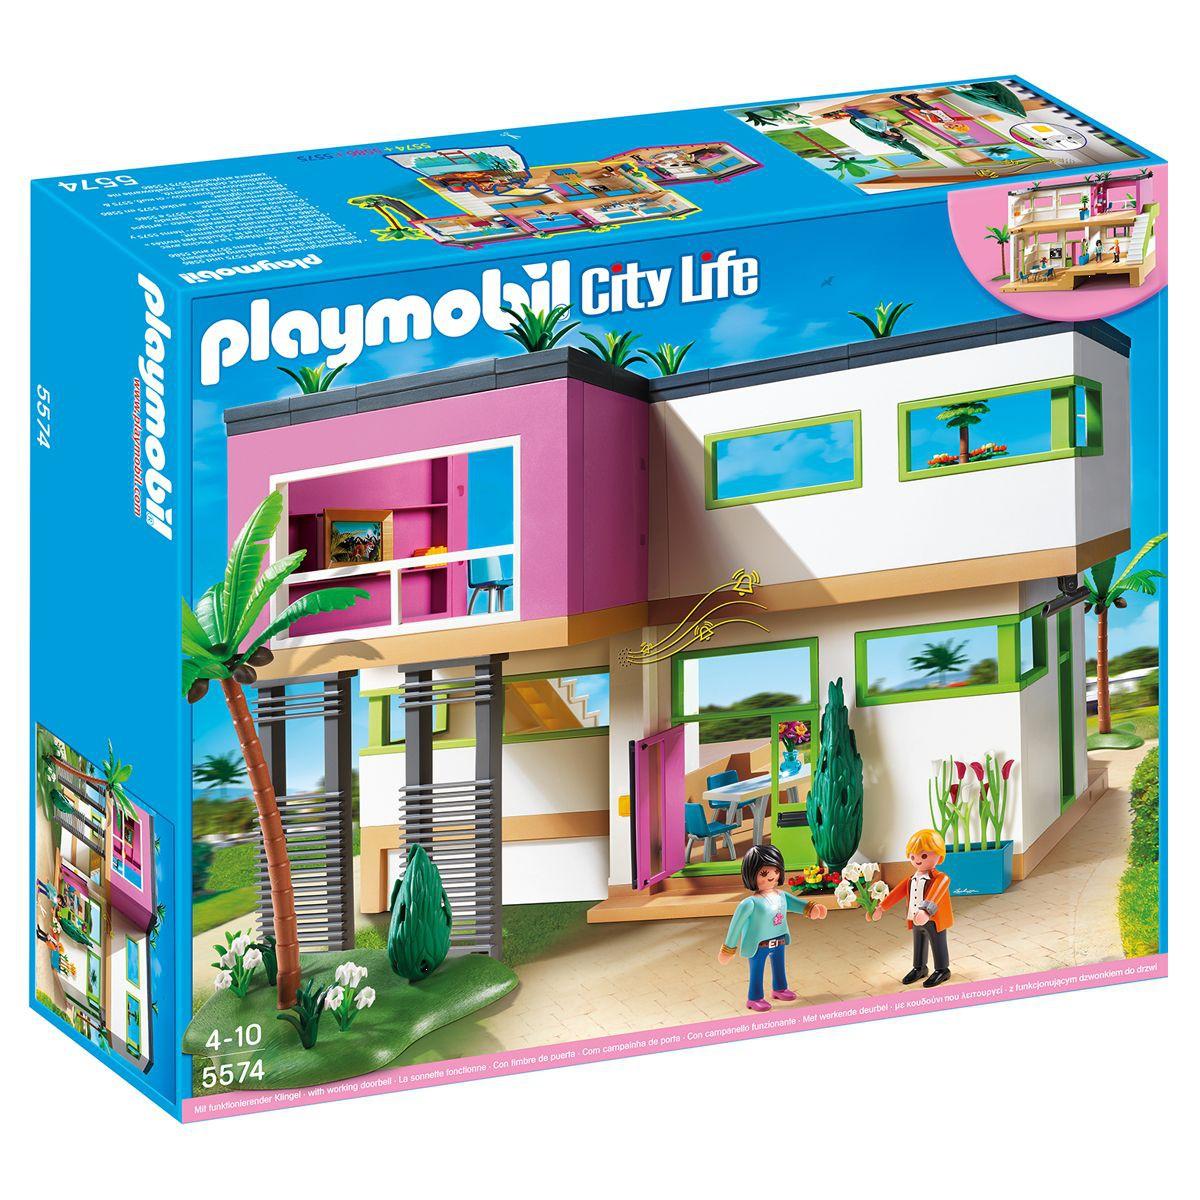 Moderne Maison Moderne Playmobil Playmobil Maison Maison Playmobil Moderne 8n0wNvm